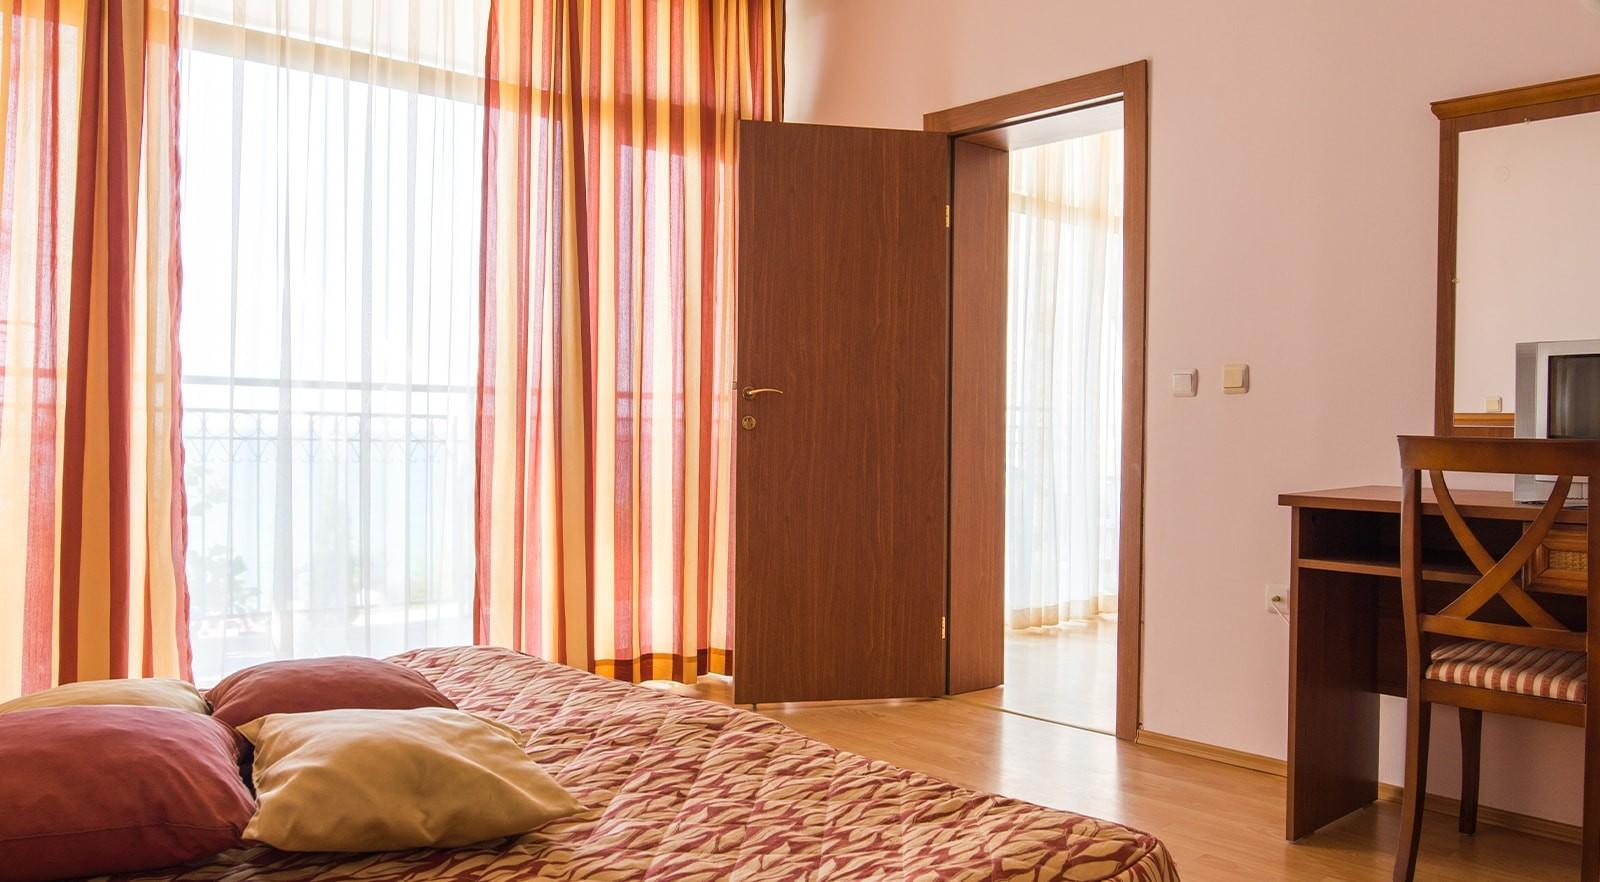 Хотел Цезар Палас 4* - едноспален апартамент